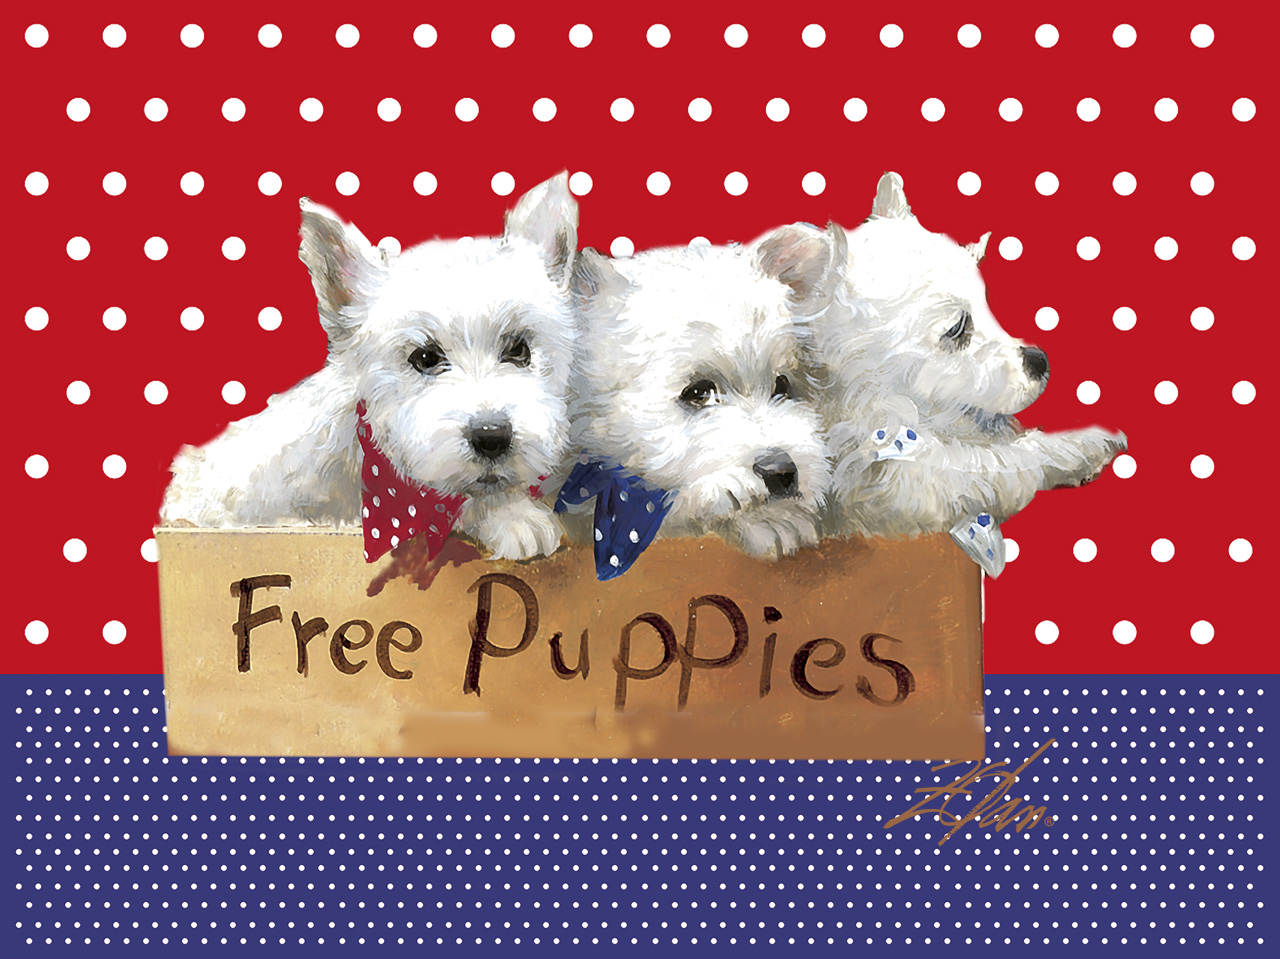 zolan free puppies